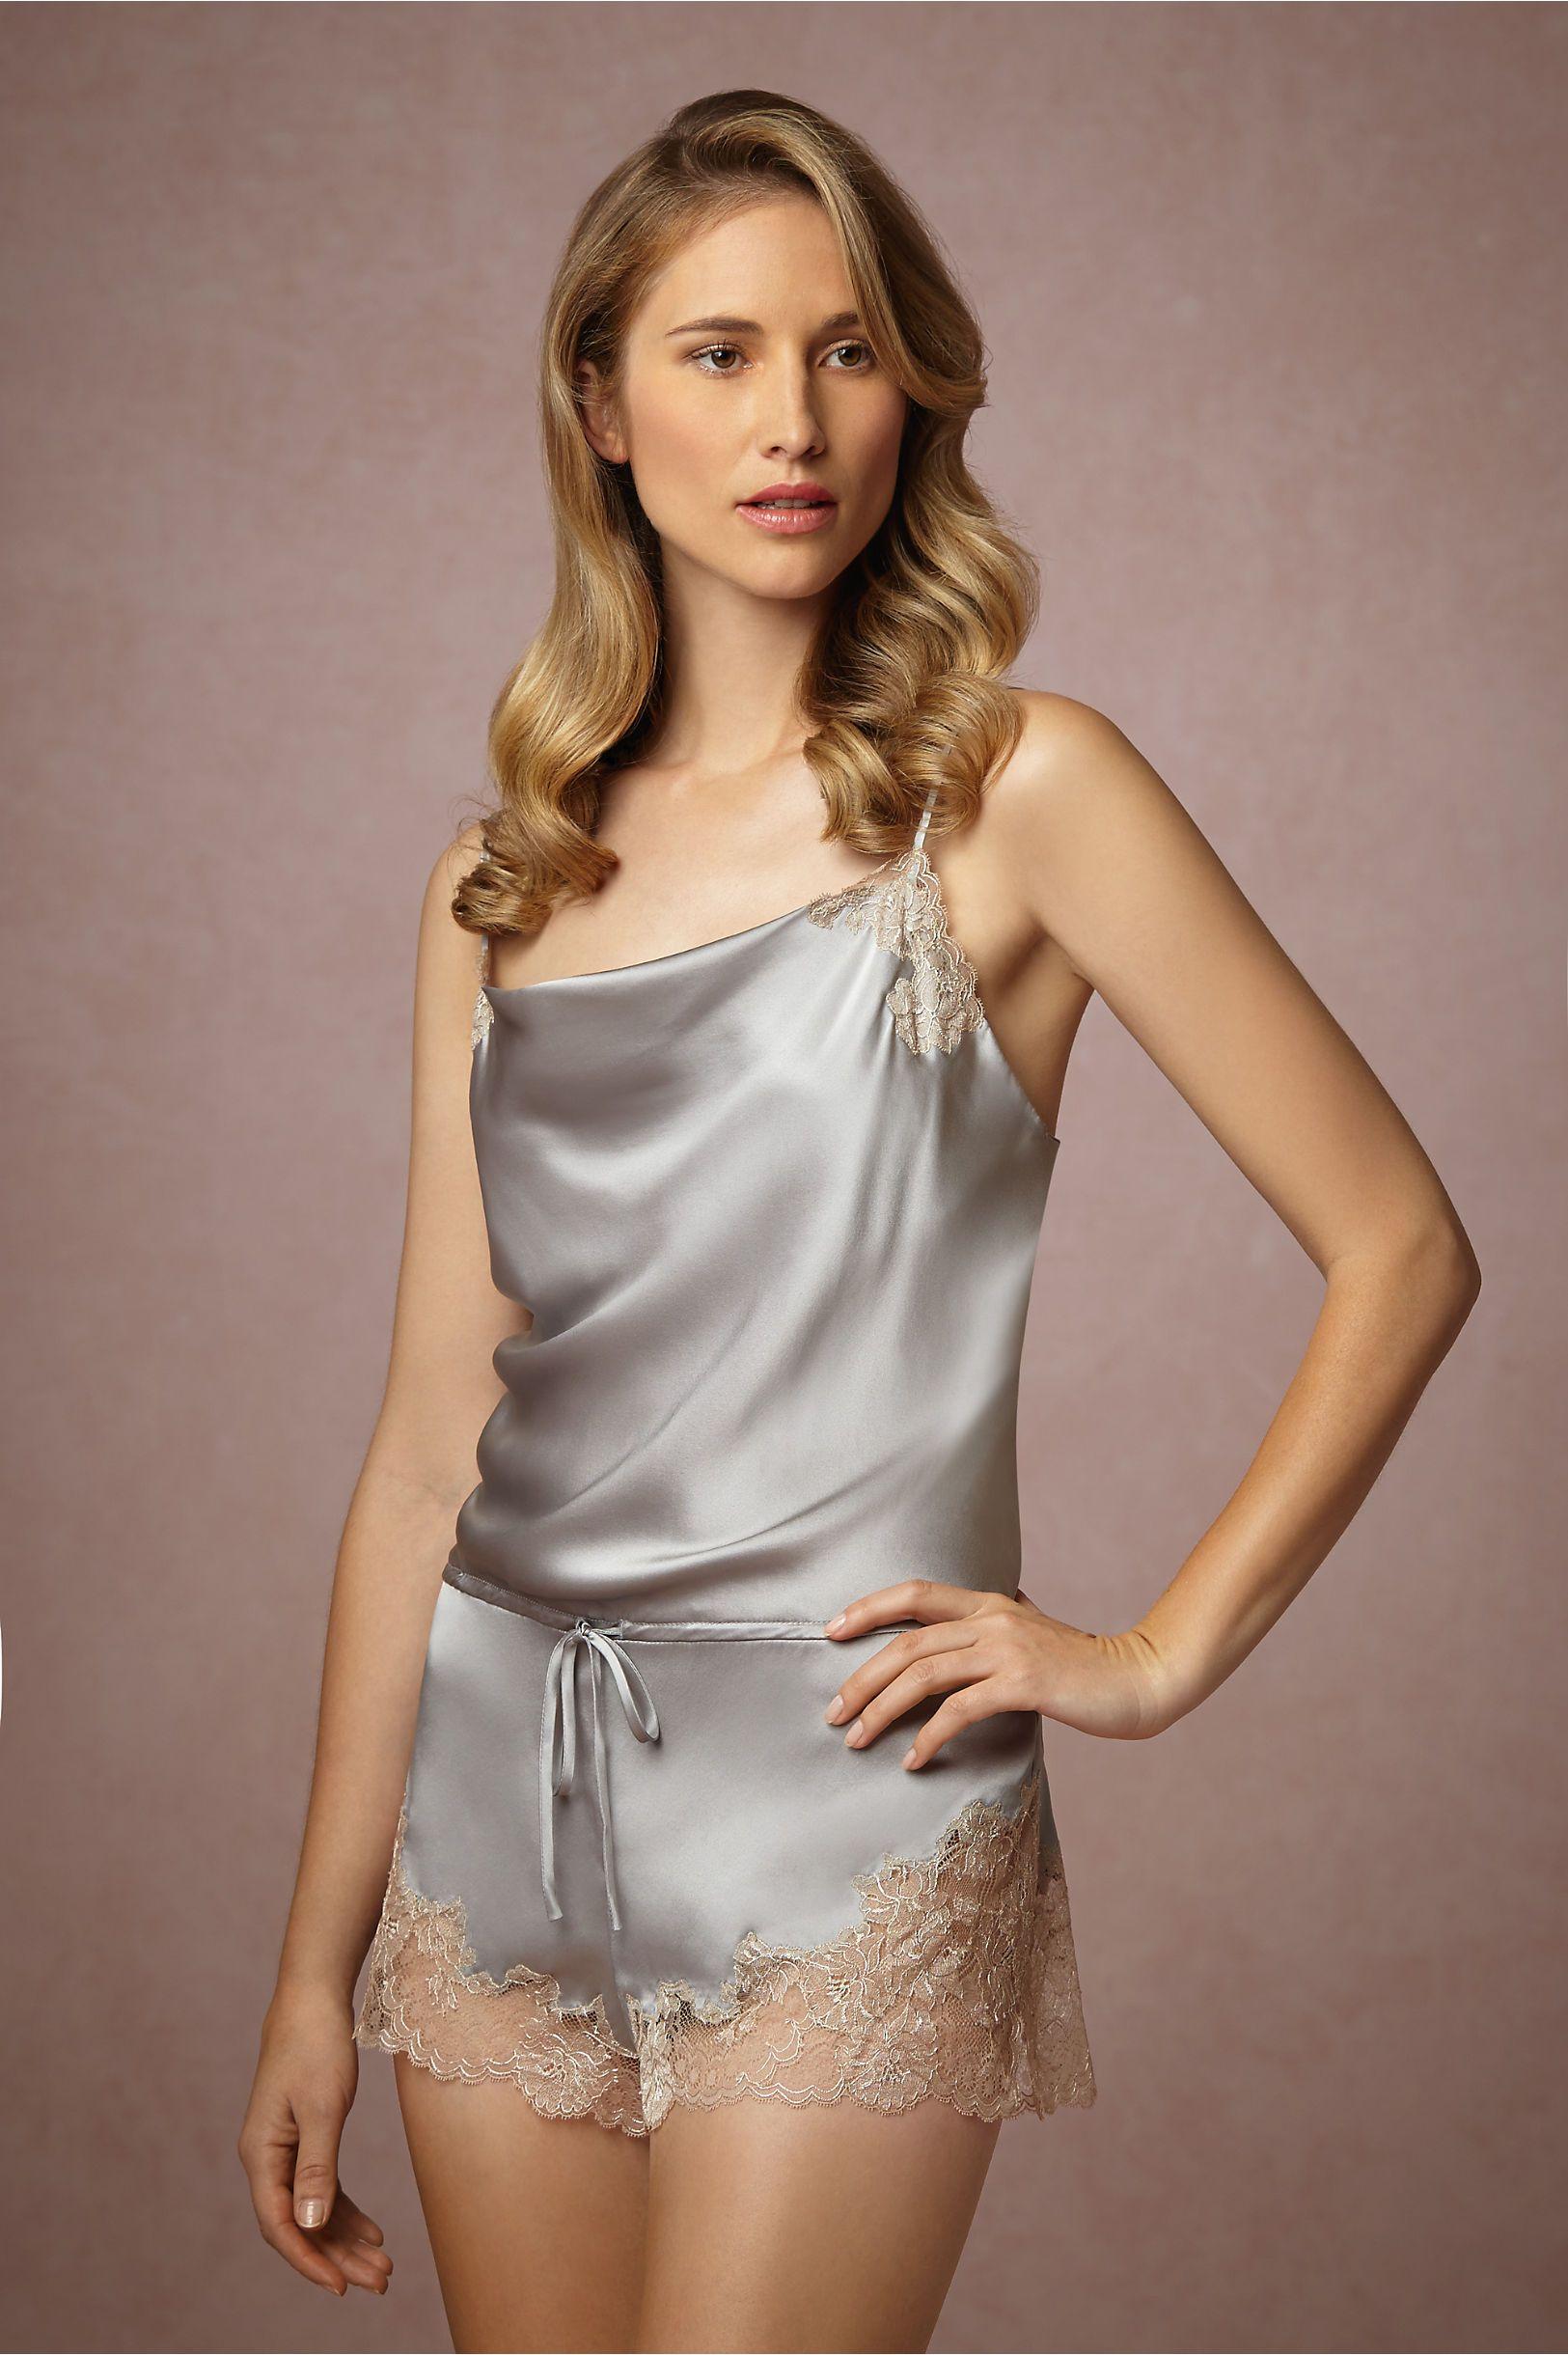 Virginie romper in bride bridal lingerie at bhldn glam for Corset bras for wedding dresses